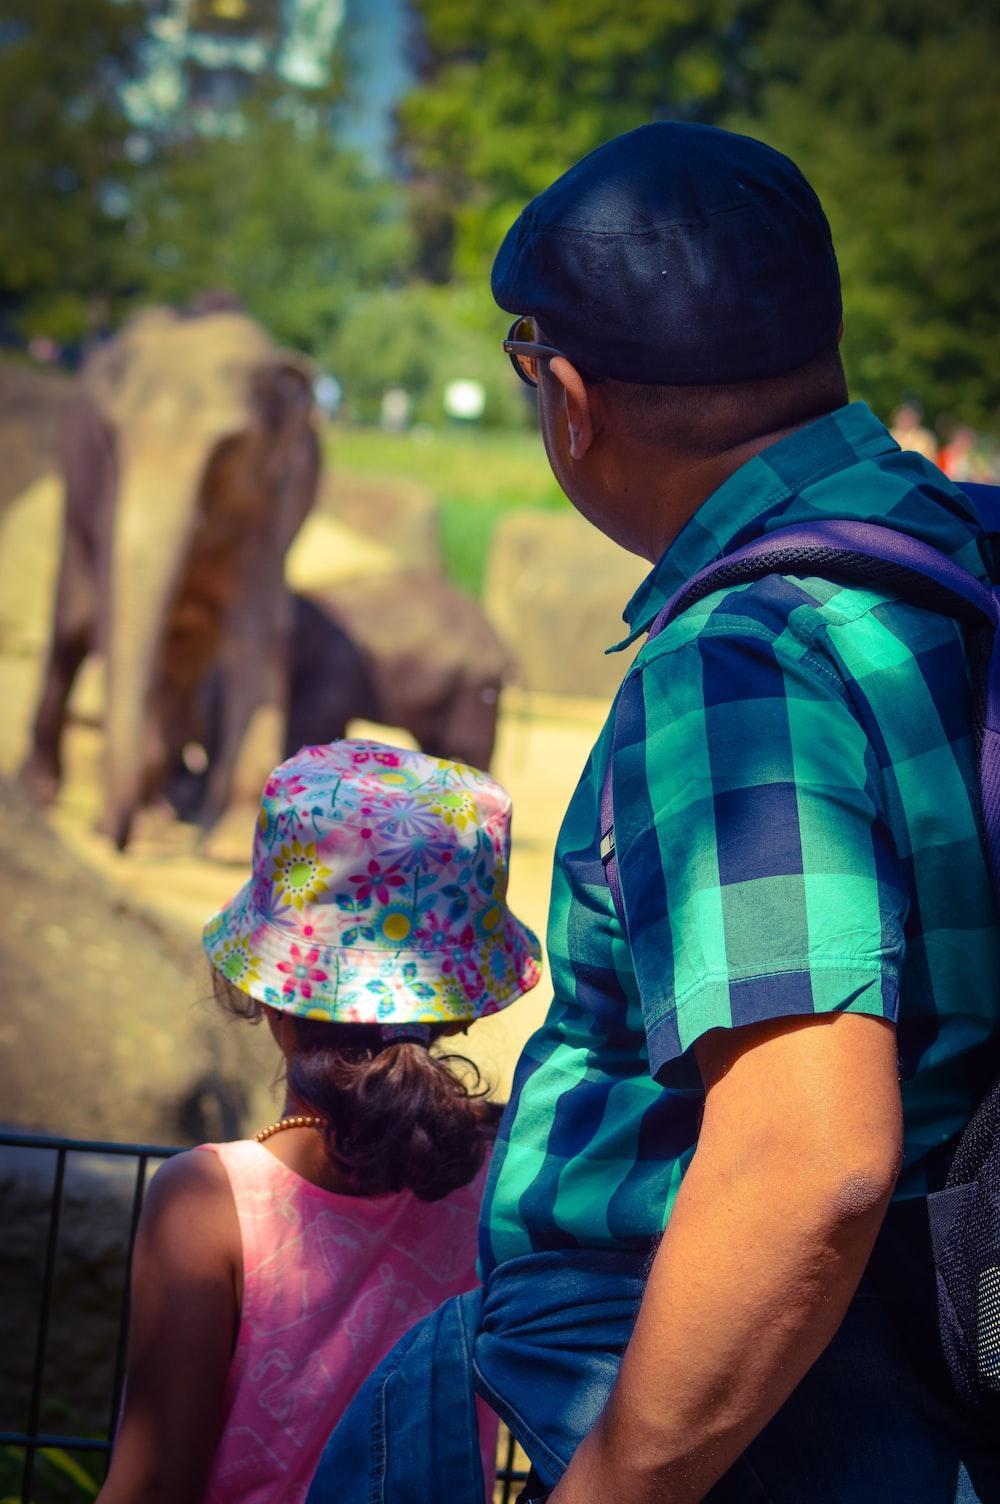 man wearing blue checked shirt standing near girl staring at elephants